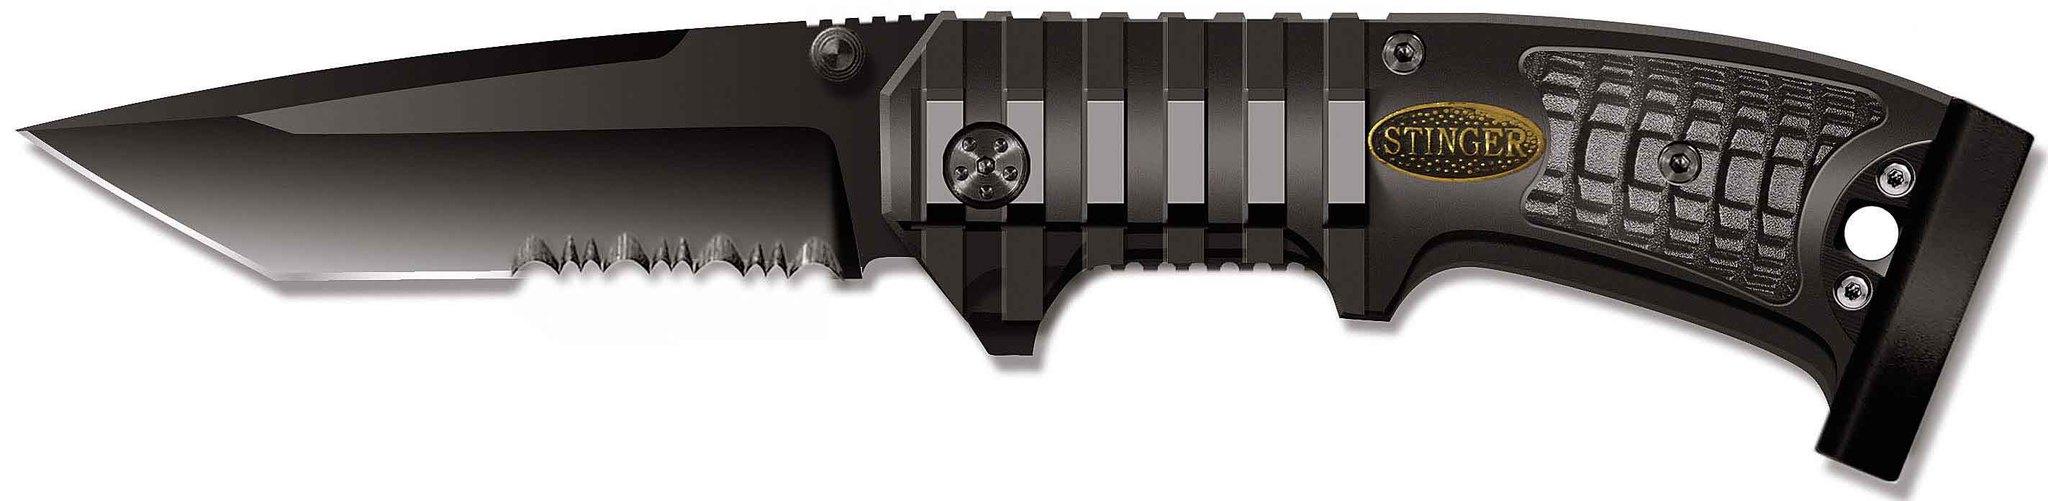 Нож складной Stinger, 90 мм (черн.), рукоять: сталь/алюмин./пласт. (черн.), с клипом, коробка картон23 февраля<br>Нож складной Stinger, 90 мм (черный), рукоять: сталь/алюминий/пластик (черный), с клипом, коробка картон<br>